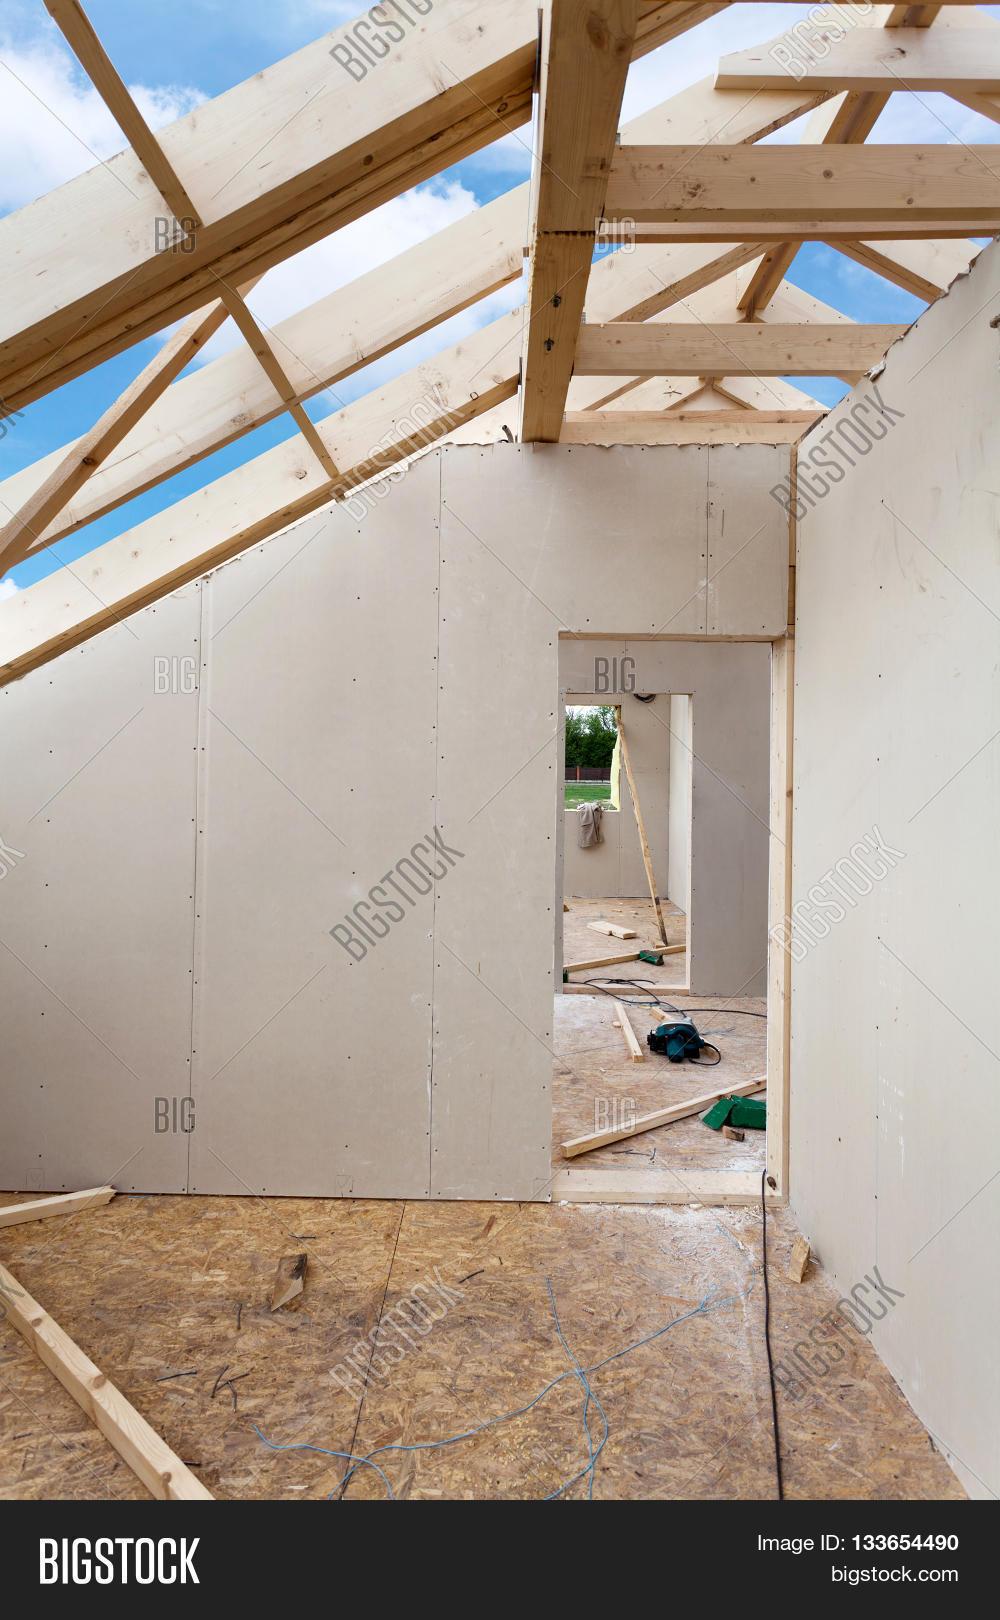 Attic Room Under Construction With Gypsum Plaster Boards